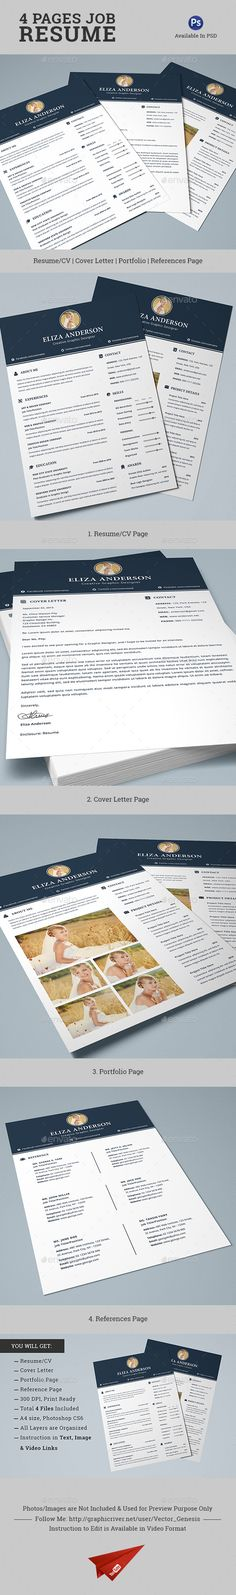 47 best Resume images on Pinterest Resume design, Resume templates